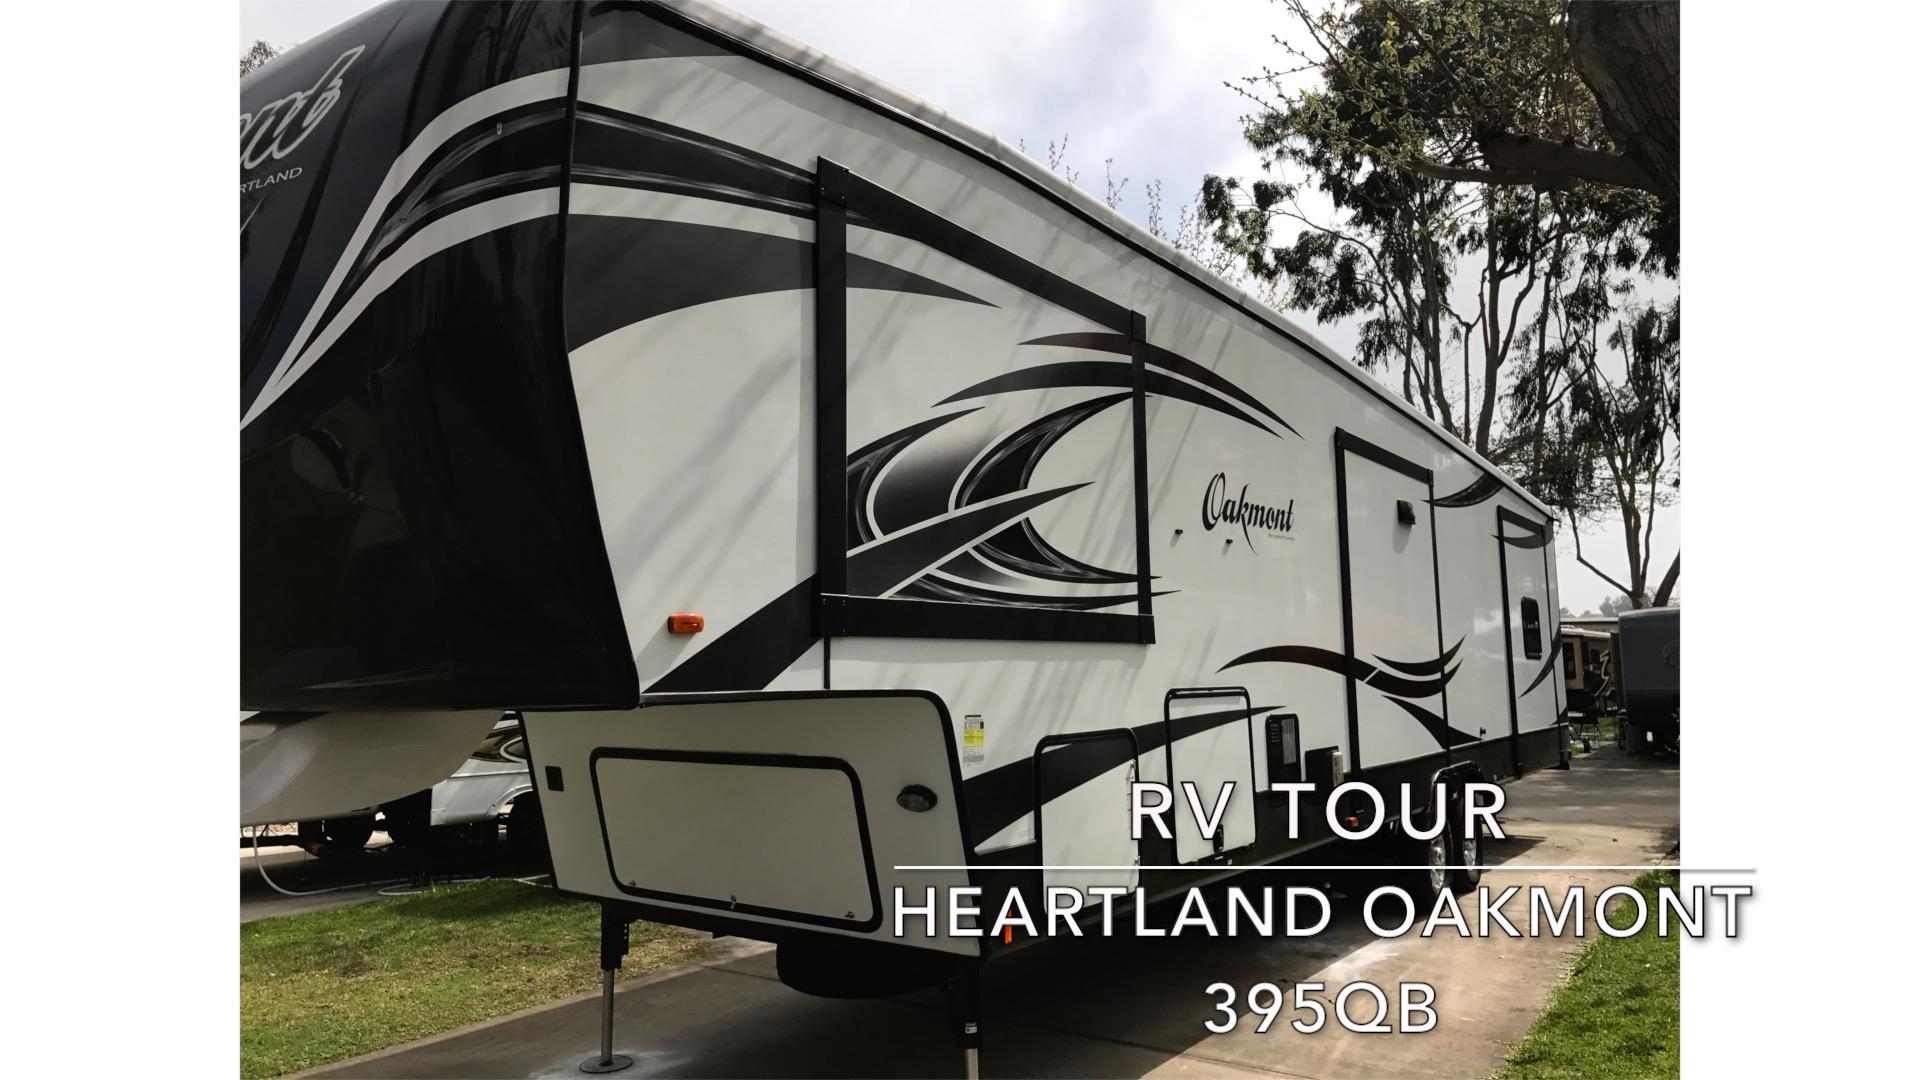 Video Tour of Our RV: Heartland Oakmont 395QB